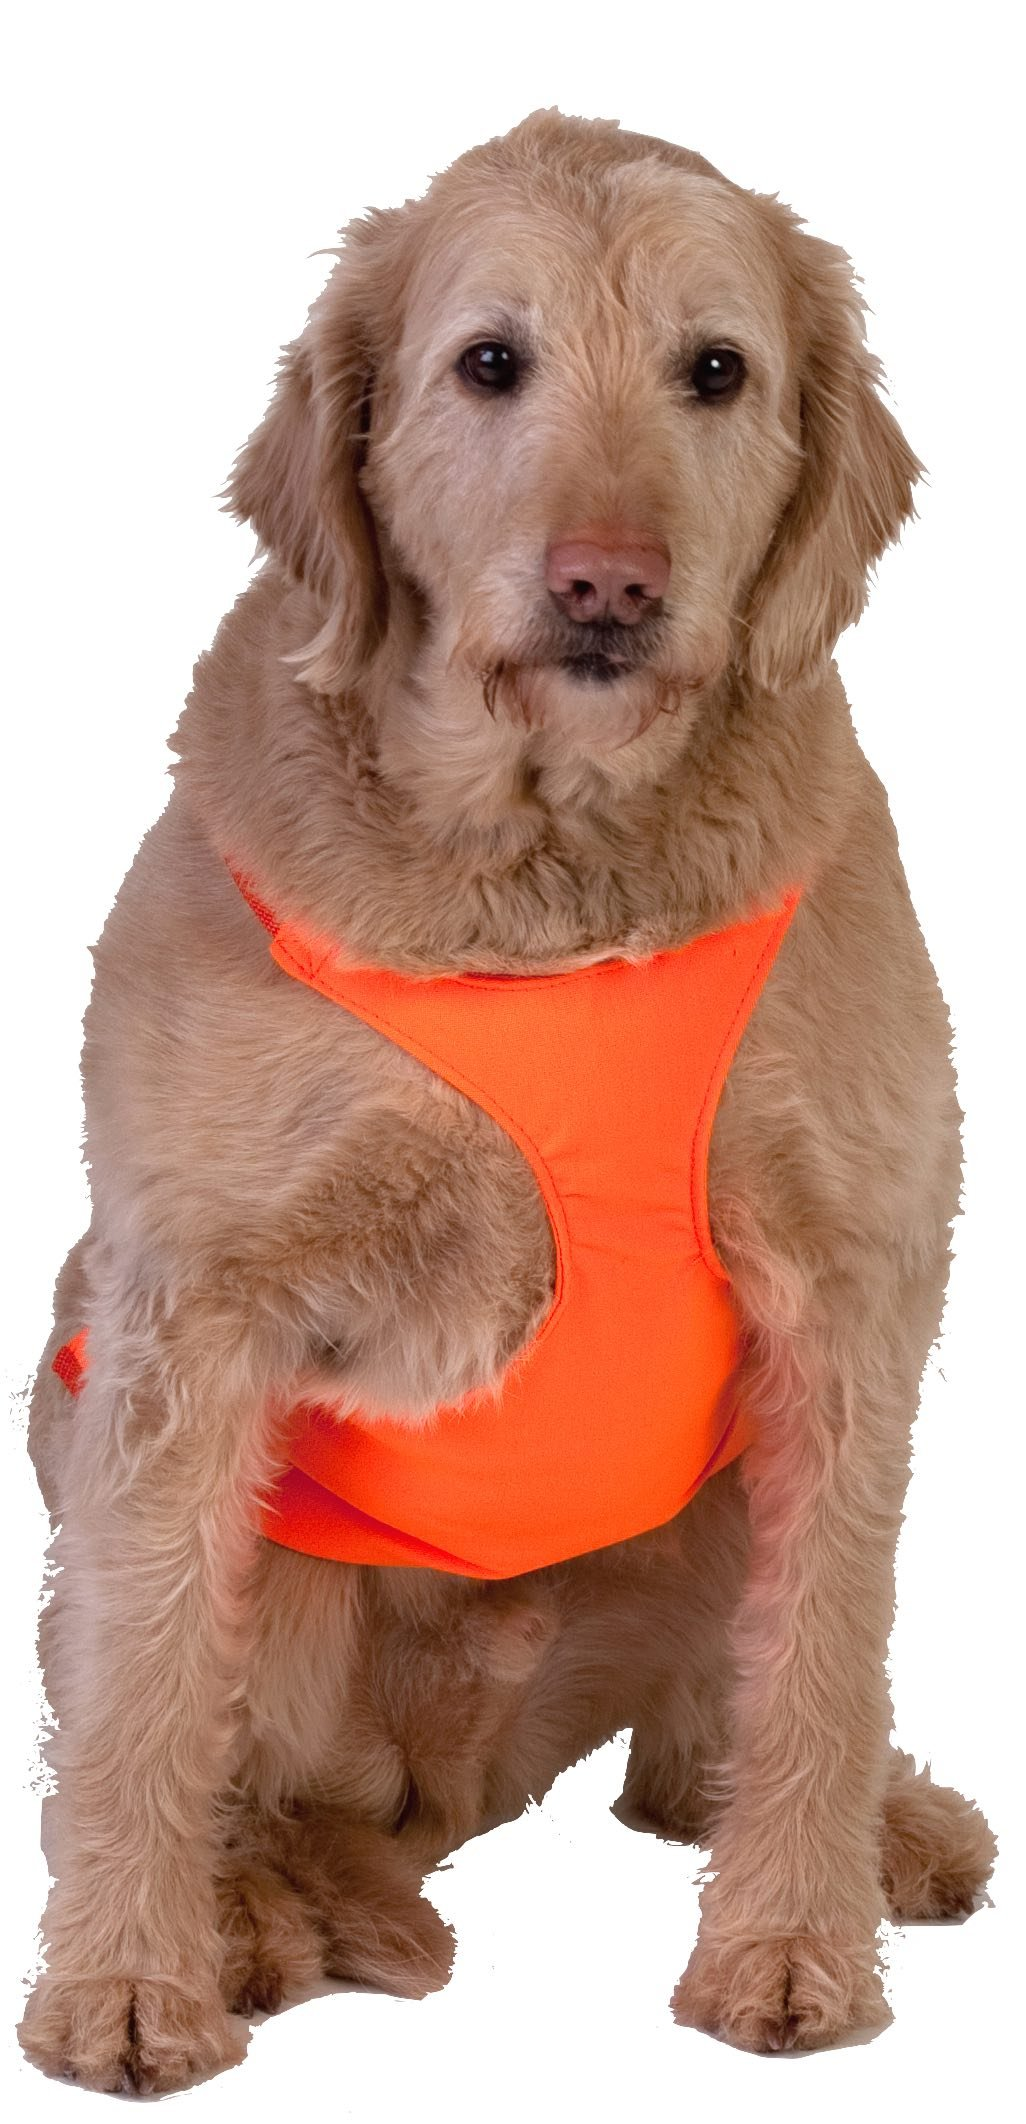 Dog Not Gone No Fly Zone Safety Chest Vest, Large, Orange by Dog Not Gone